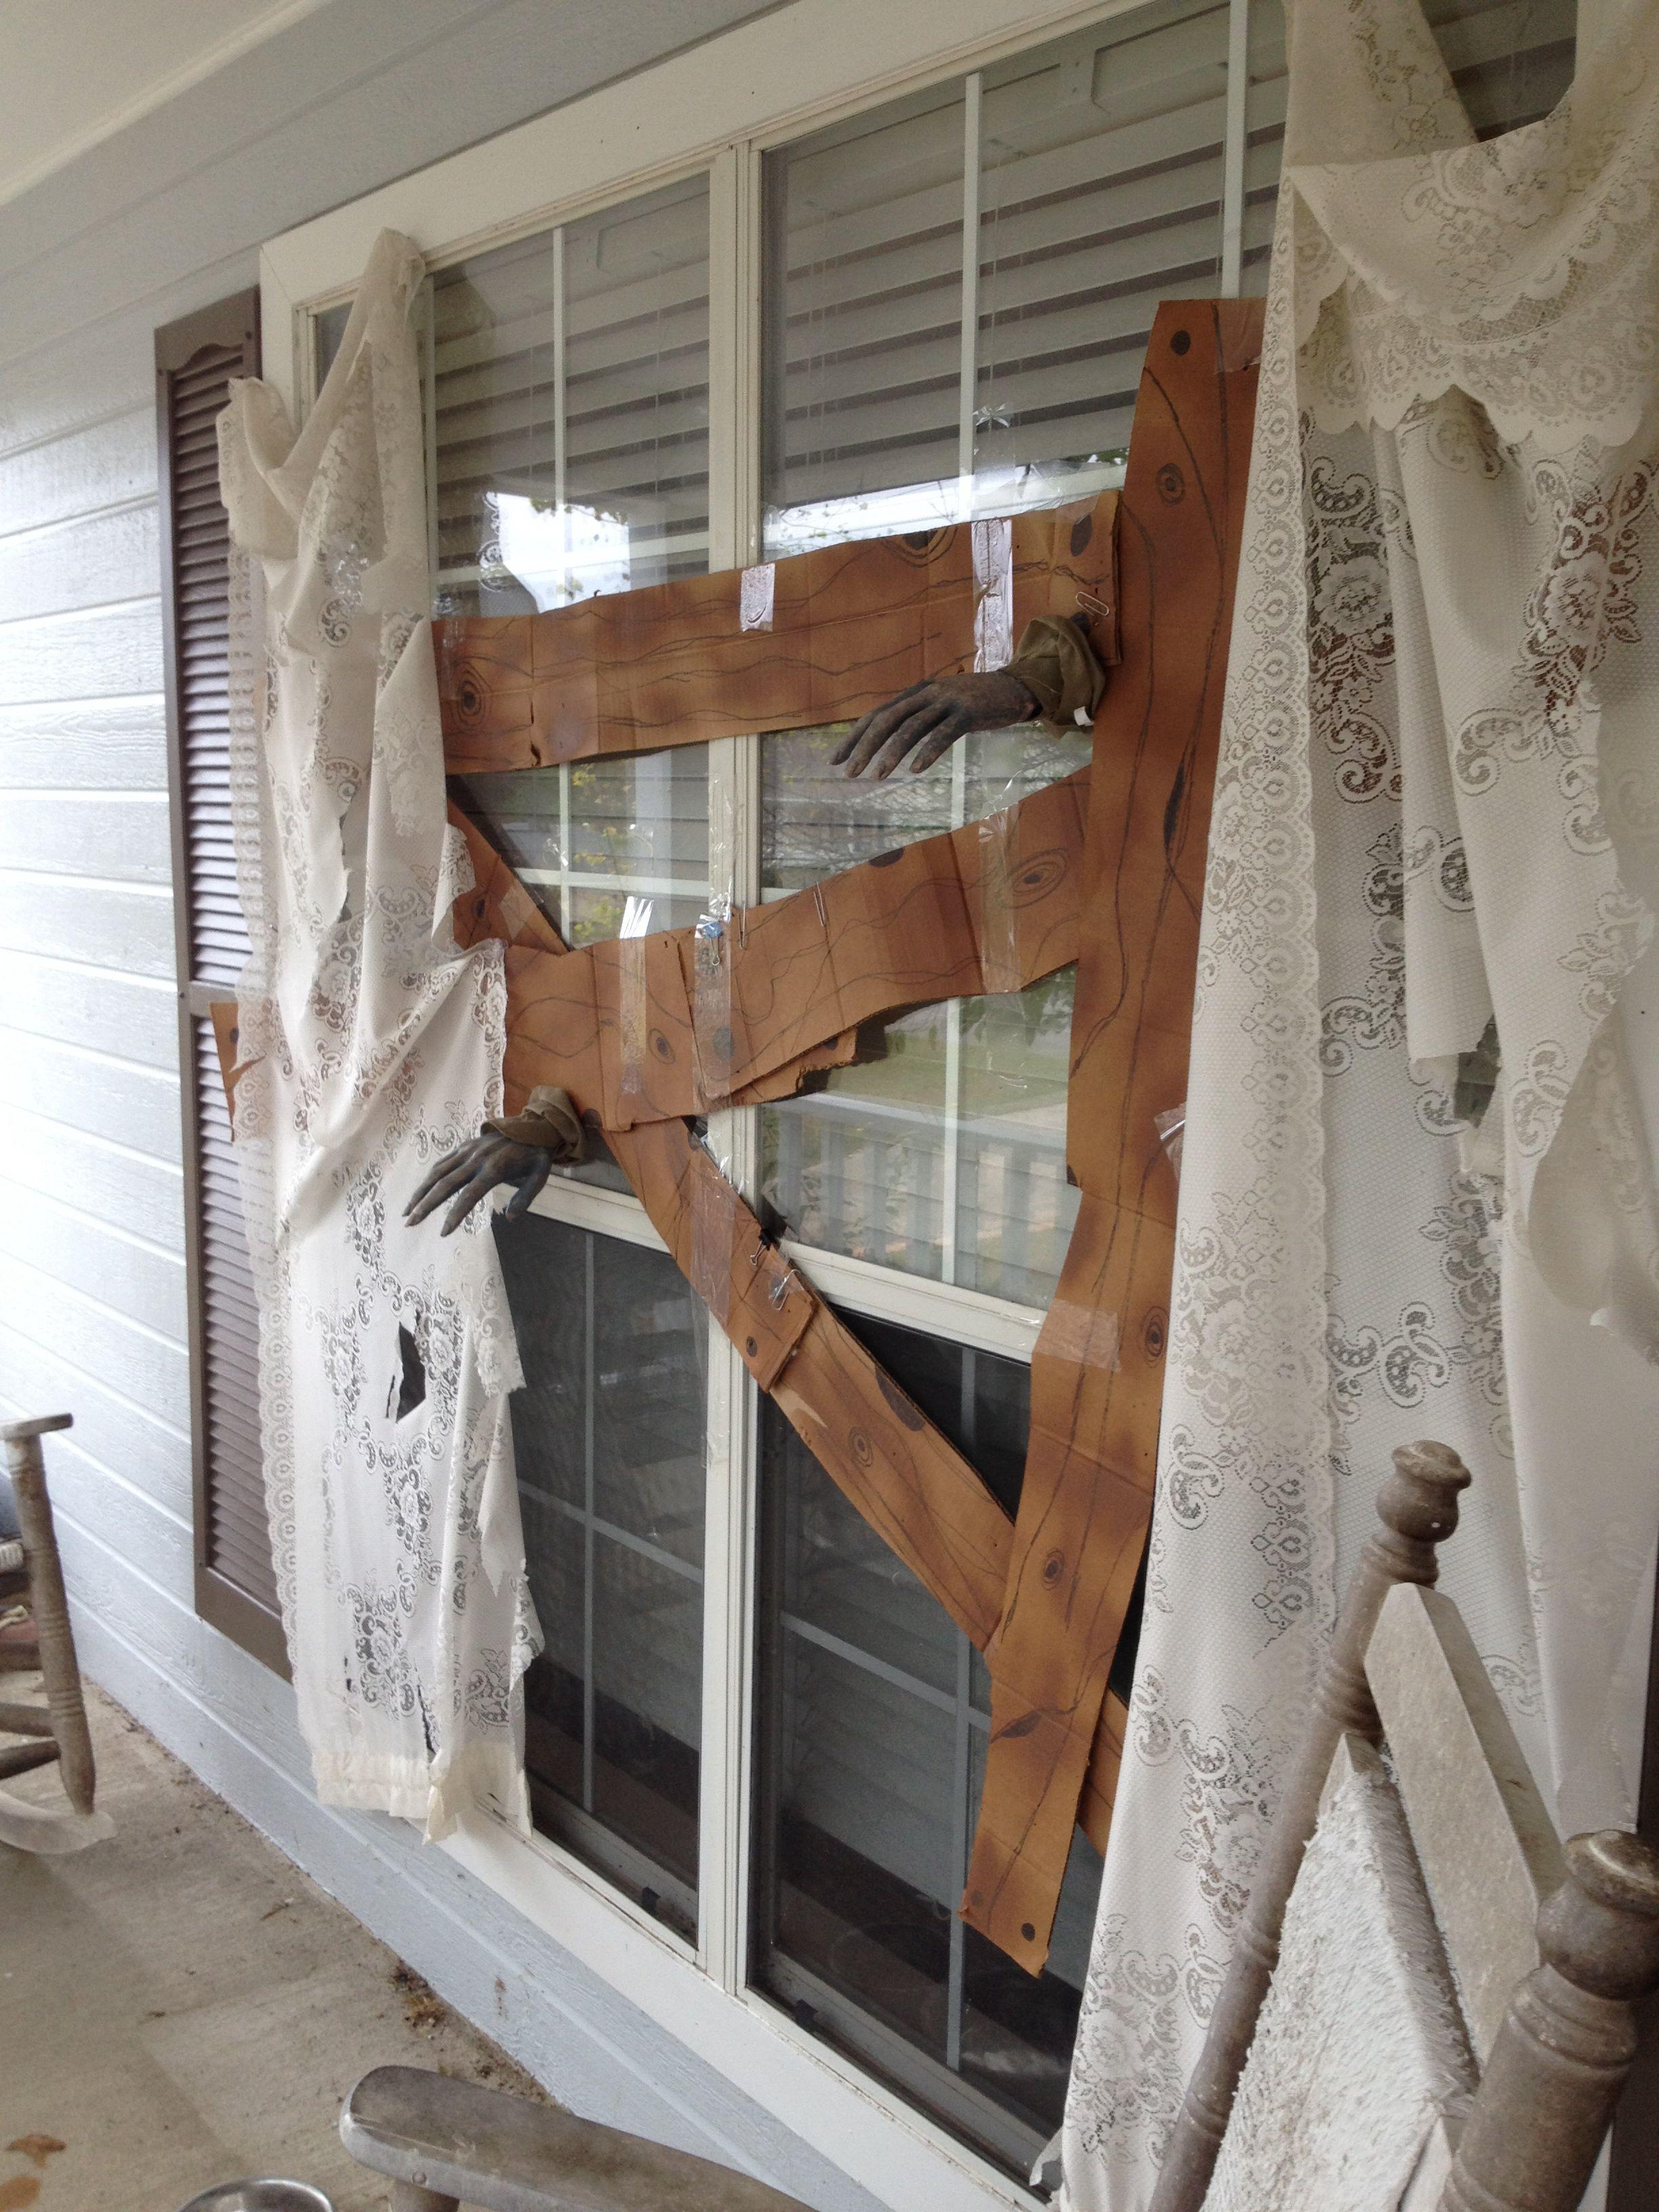 Window cover up ideas  creative boardedup window outdoor halloween decoration uploaded to